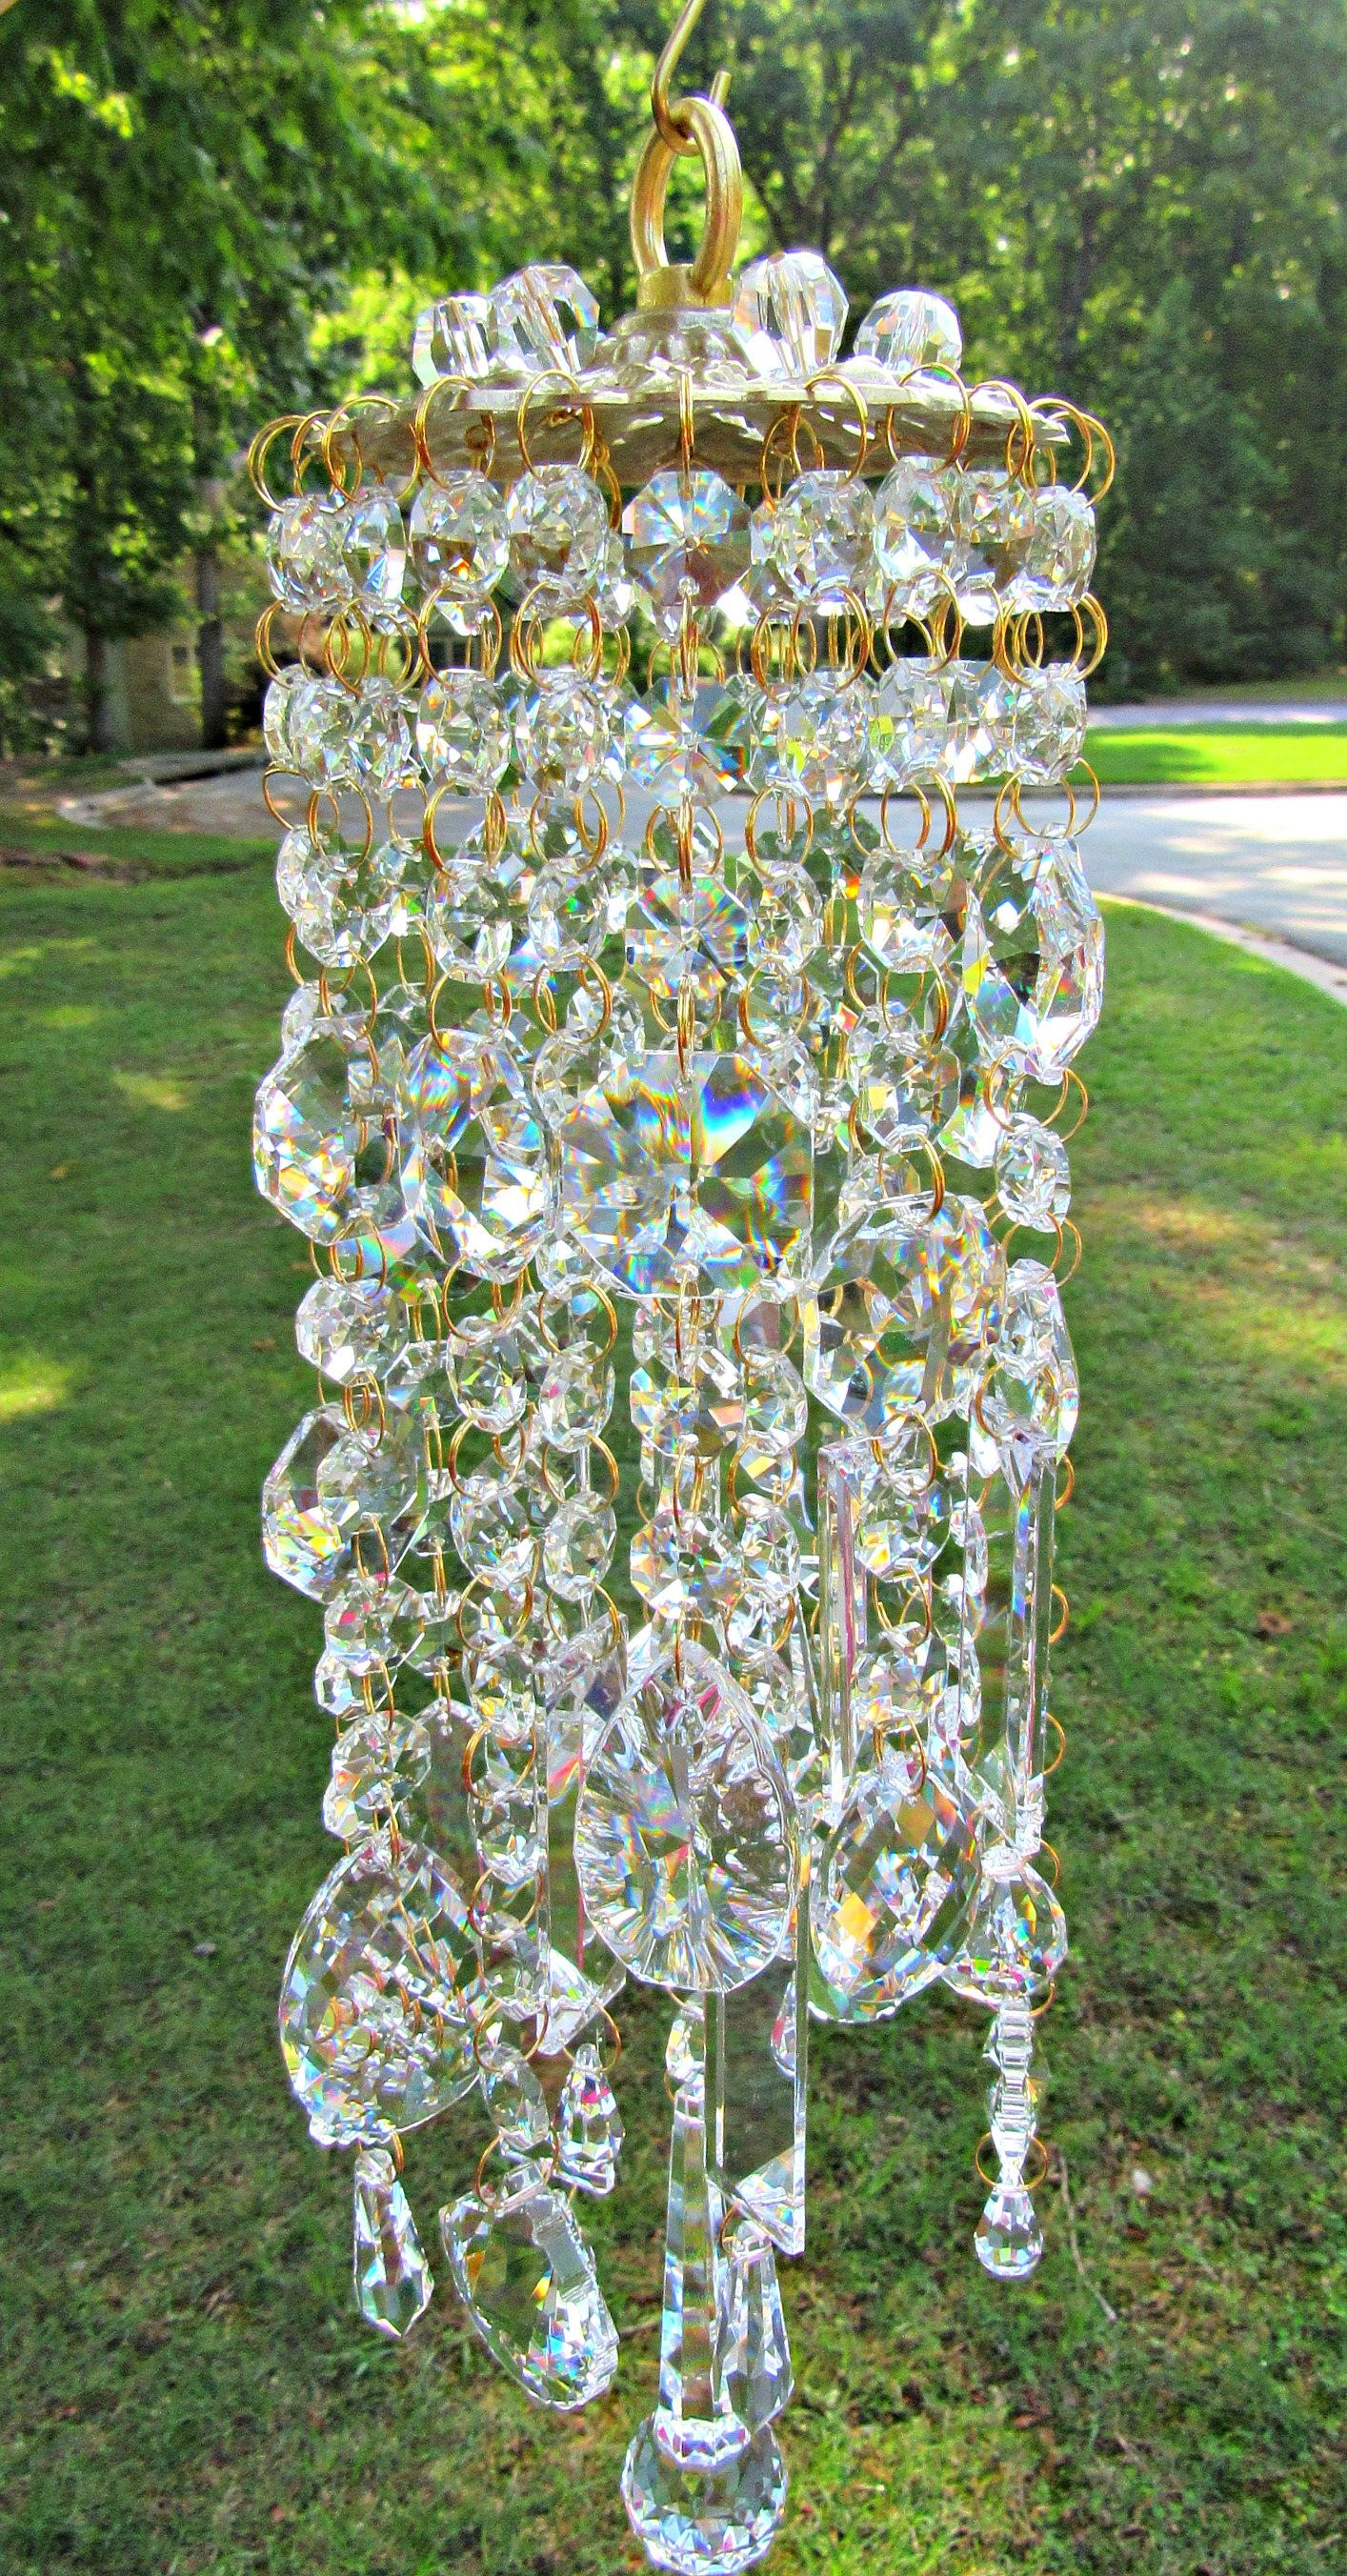 Wind Chimes Sun Catcher Garden Decor Crystal Wind Chime Glass Wind Chime Crystal Sun Catcher Patio Decor Garden Gift Wc 126 In 2020 Crystal Wind Chimes Glass Wind Chimes Wind Chimes